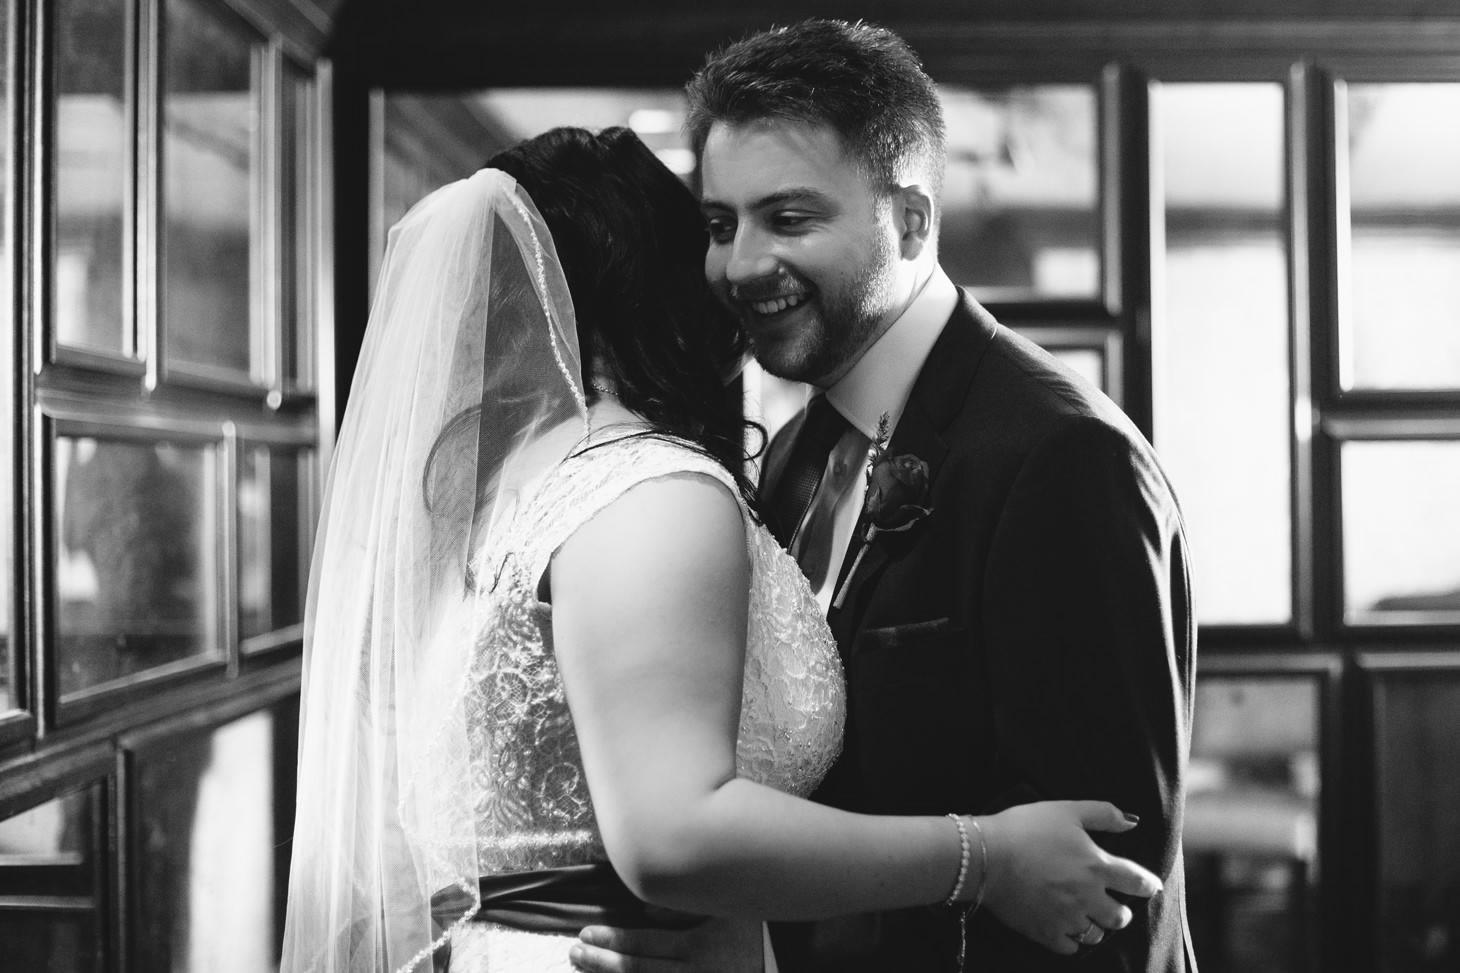 020-nyc-wedding-portrait-photographer-times-square-muse-hotel-winter-wedding-smitten-chickens.jpg